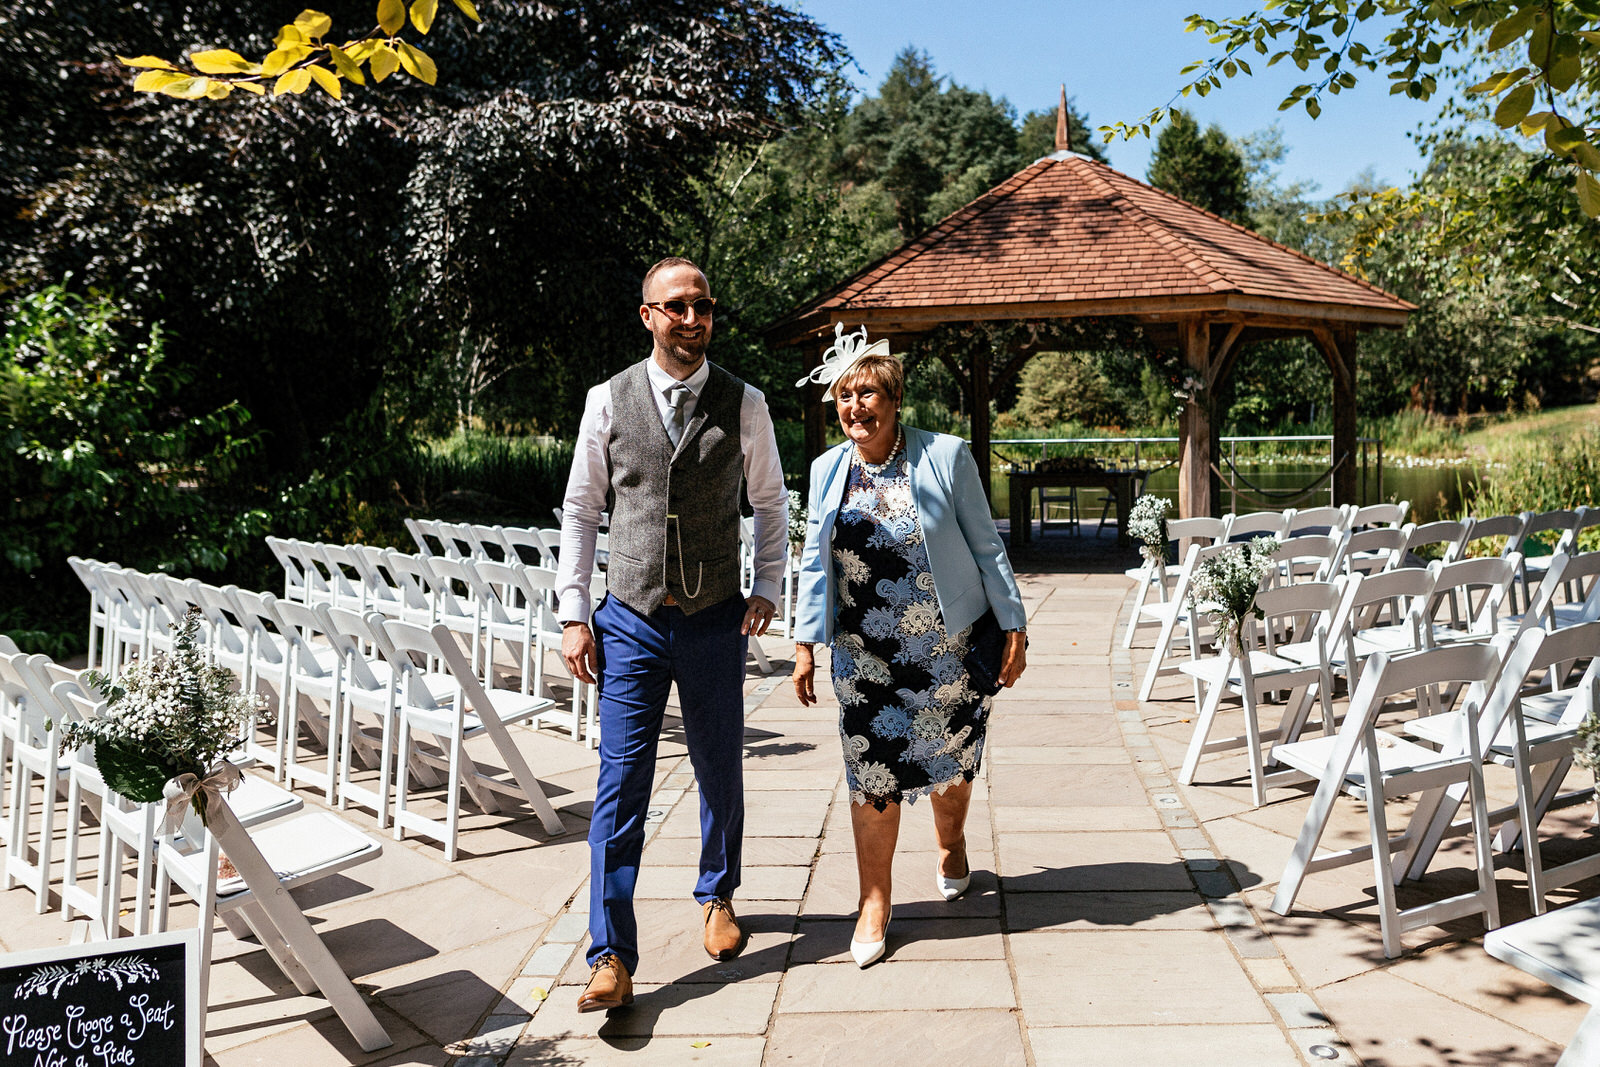 Moddershall-Oaks-Spa-Wedding-Photographer-006.jpg